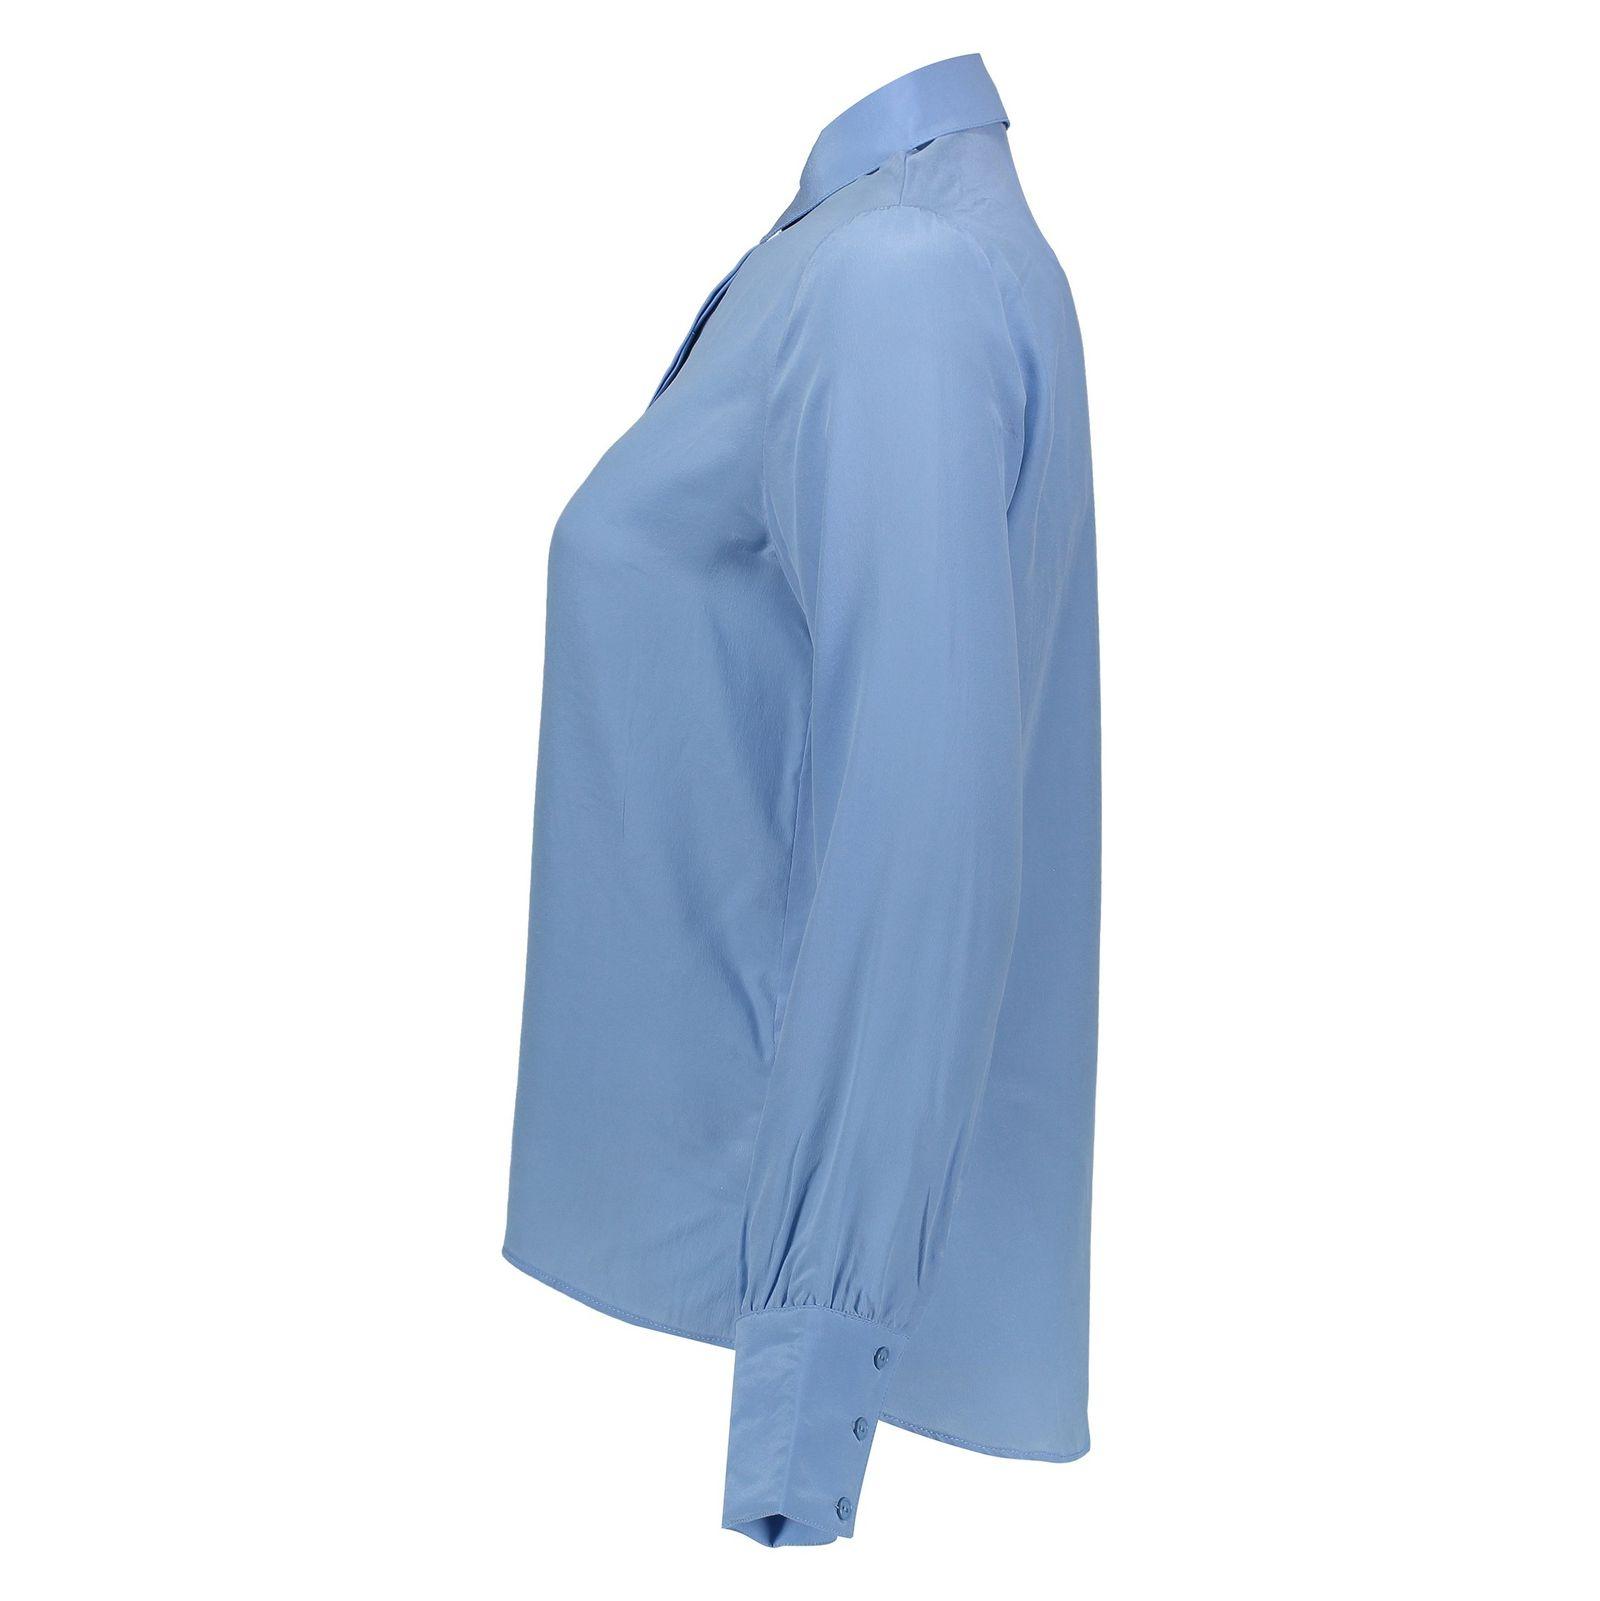 شومیز ابریشم آستین بلند زنانه - مینیموم - آبي - 3